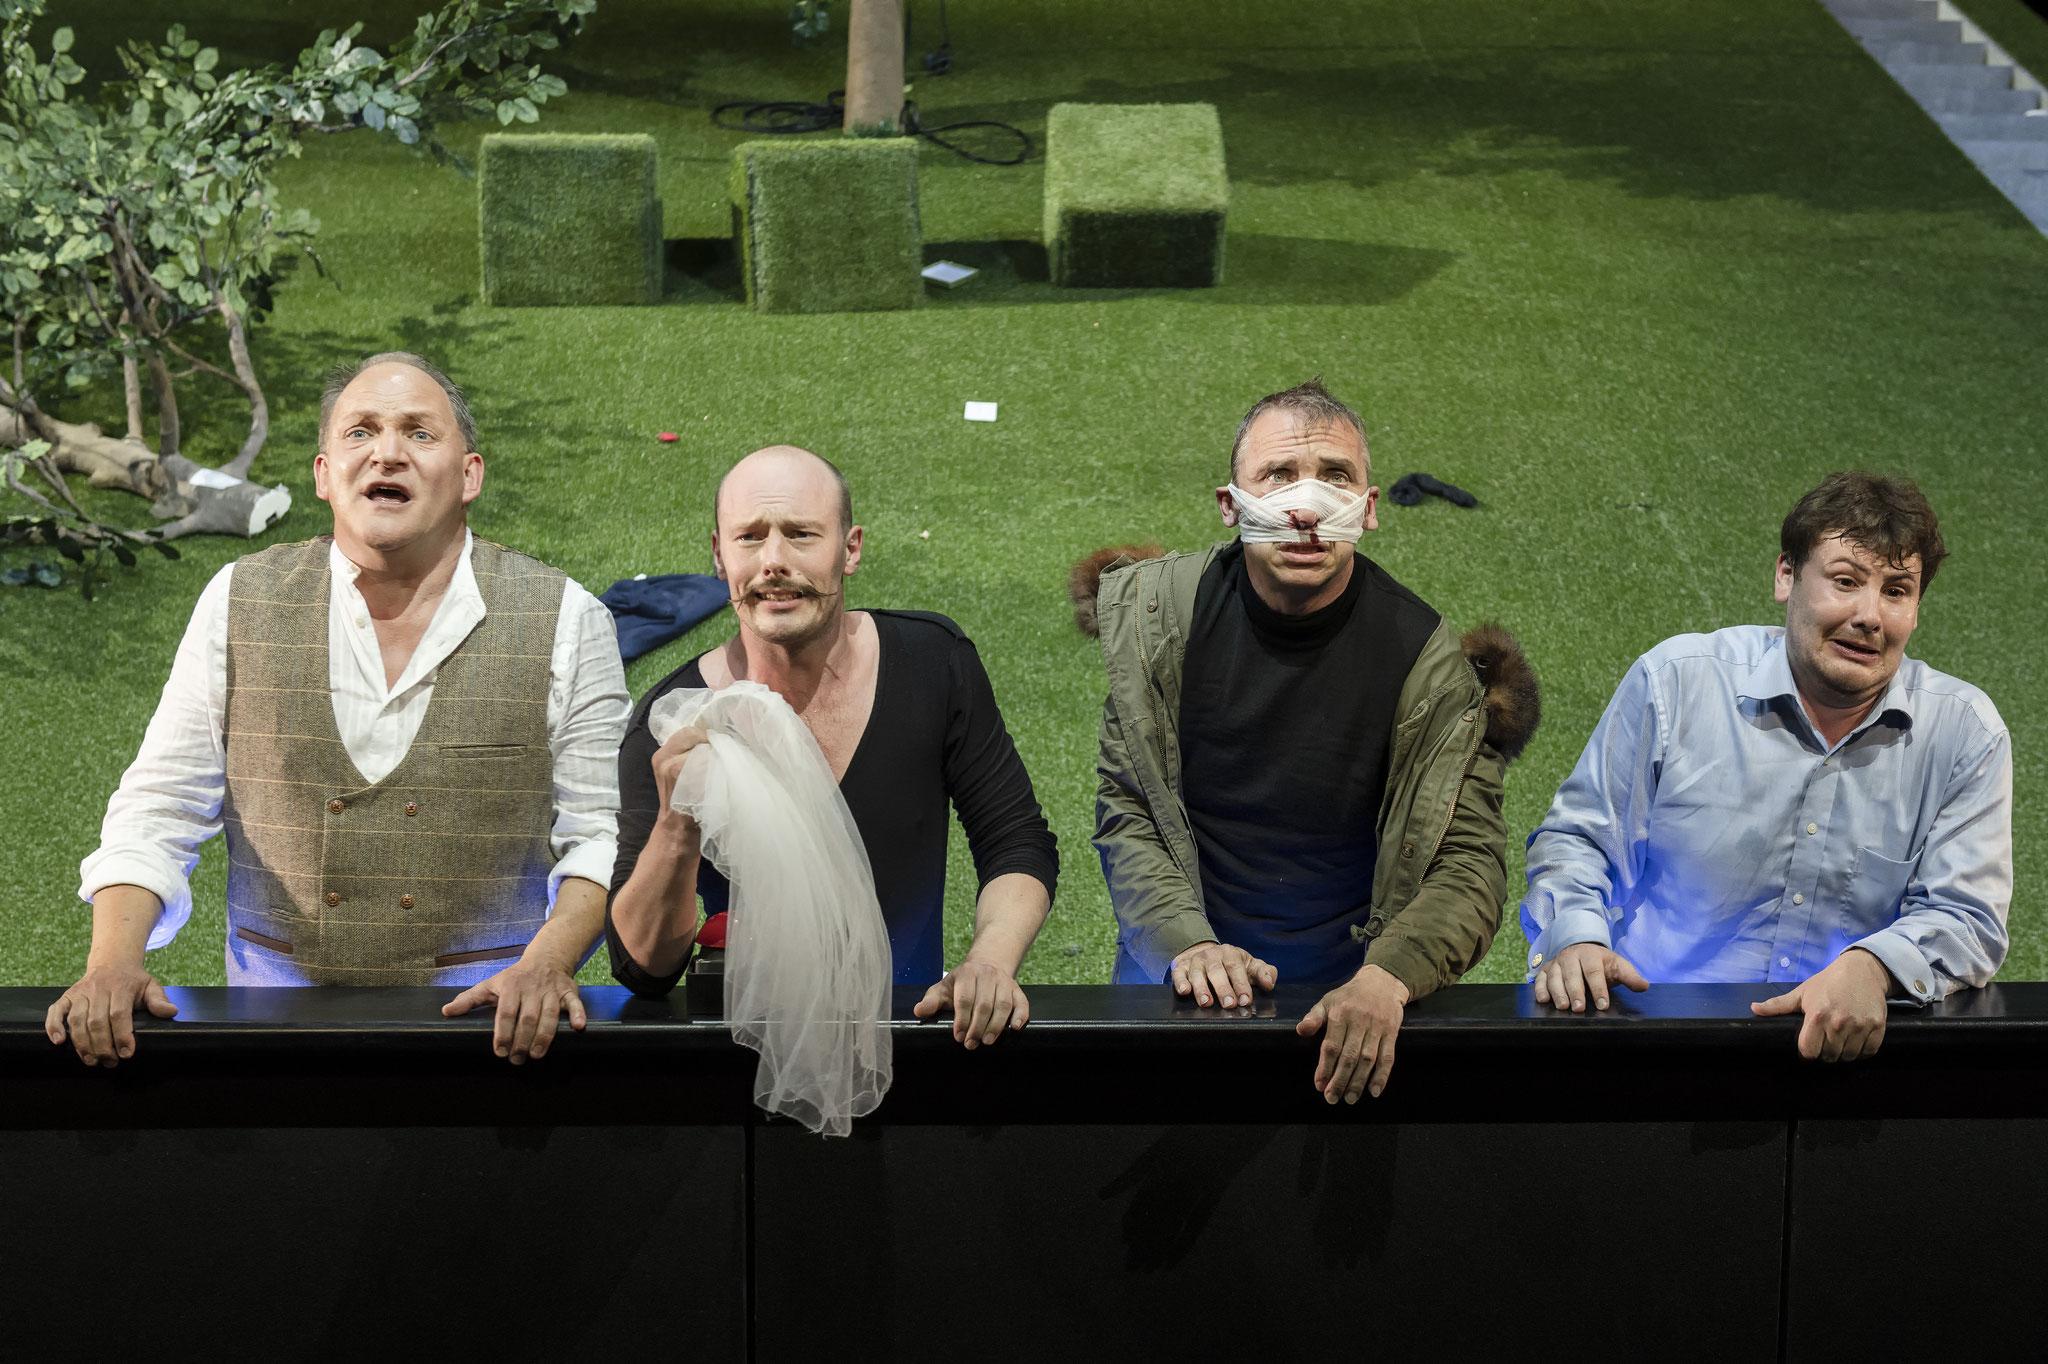 Claudio; Viel Lärm um Nichts - Theater Augsburg (2018)